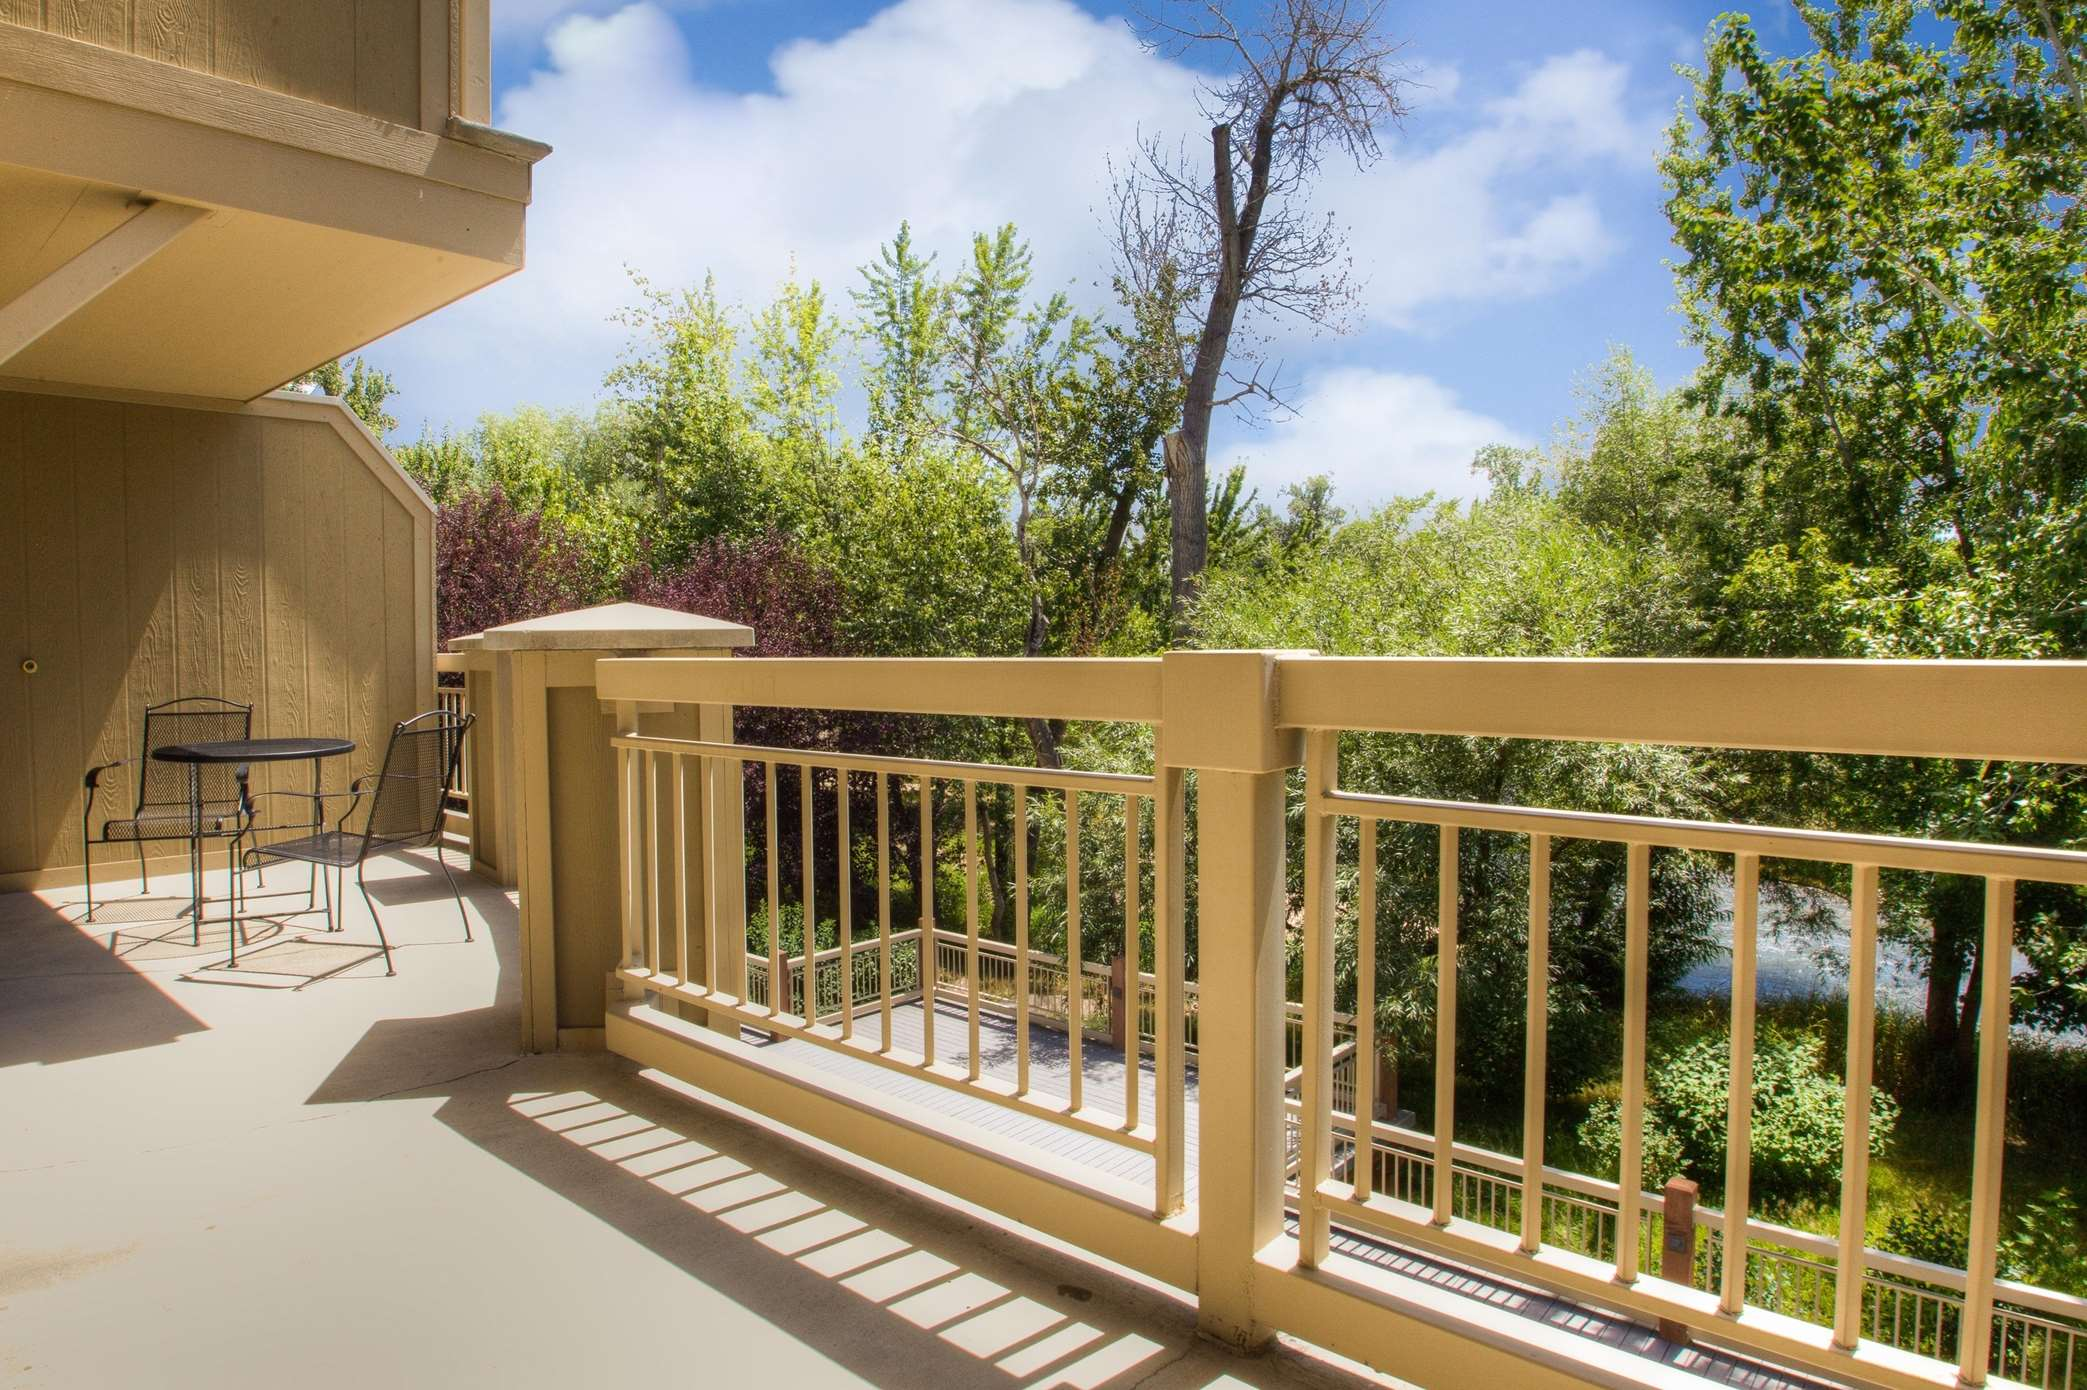 Hilton Garden Inn Boise Eagle Eagle Idaho Id